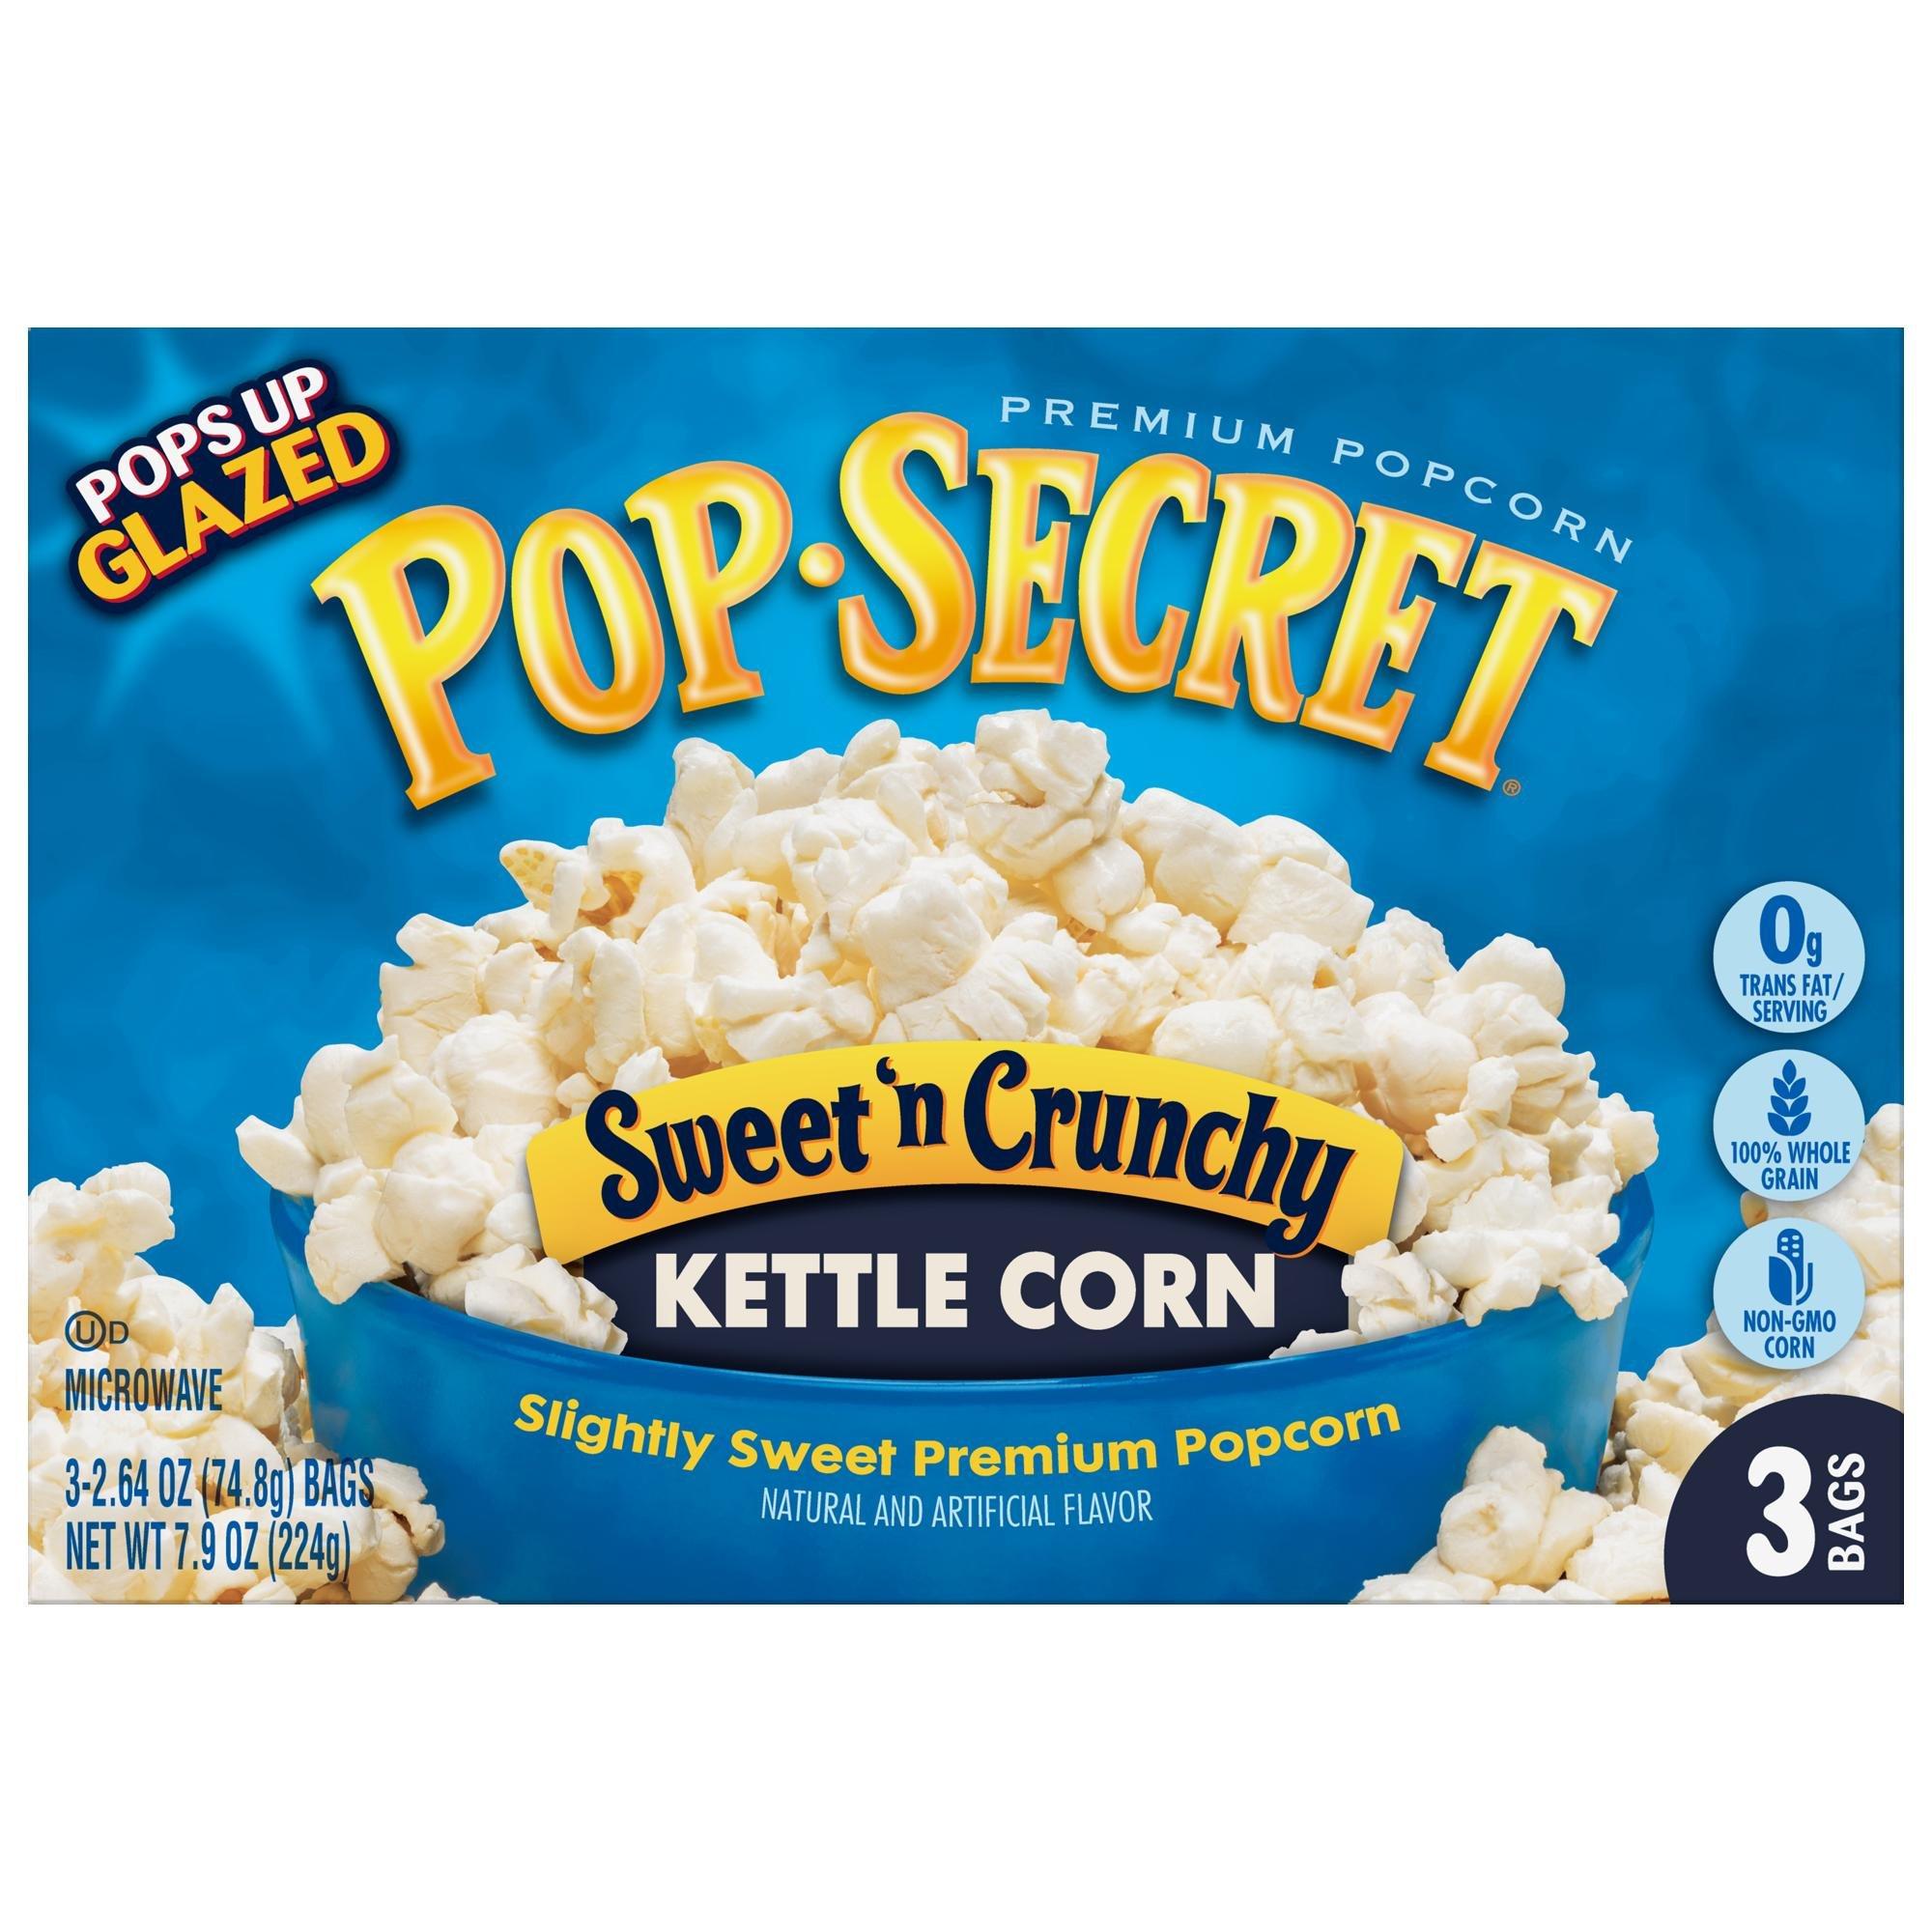 Pop Secret Popcorn, Sweet 'n Crunchy Kettle Corn, 3-Count Box